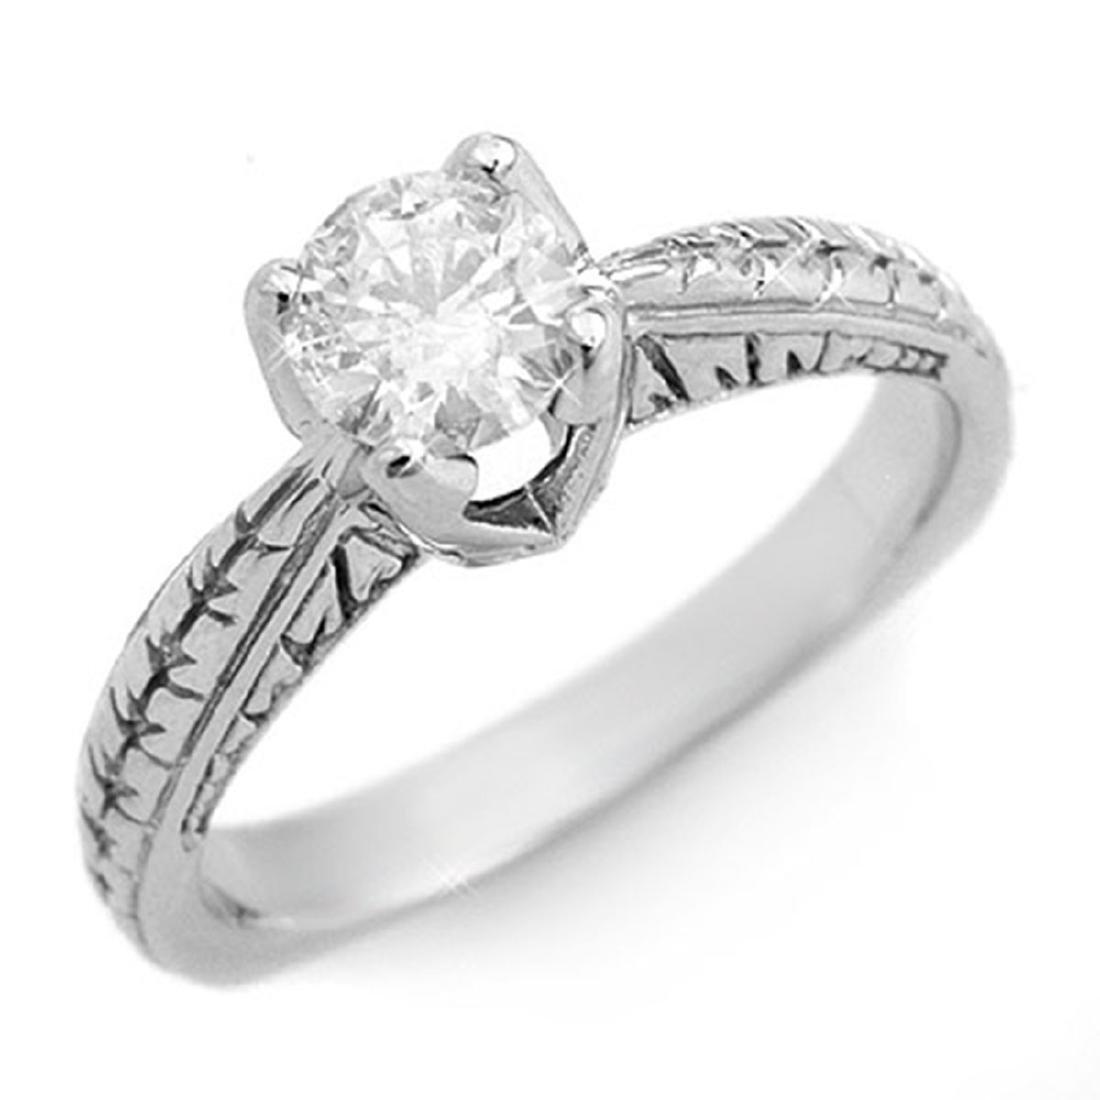 0.55 ctw VS/SI Diamond Solitaire Ring 18K White Gold -